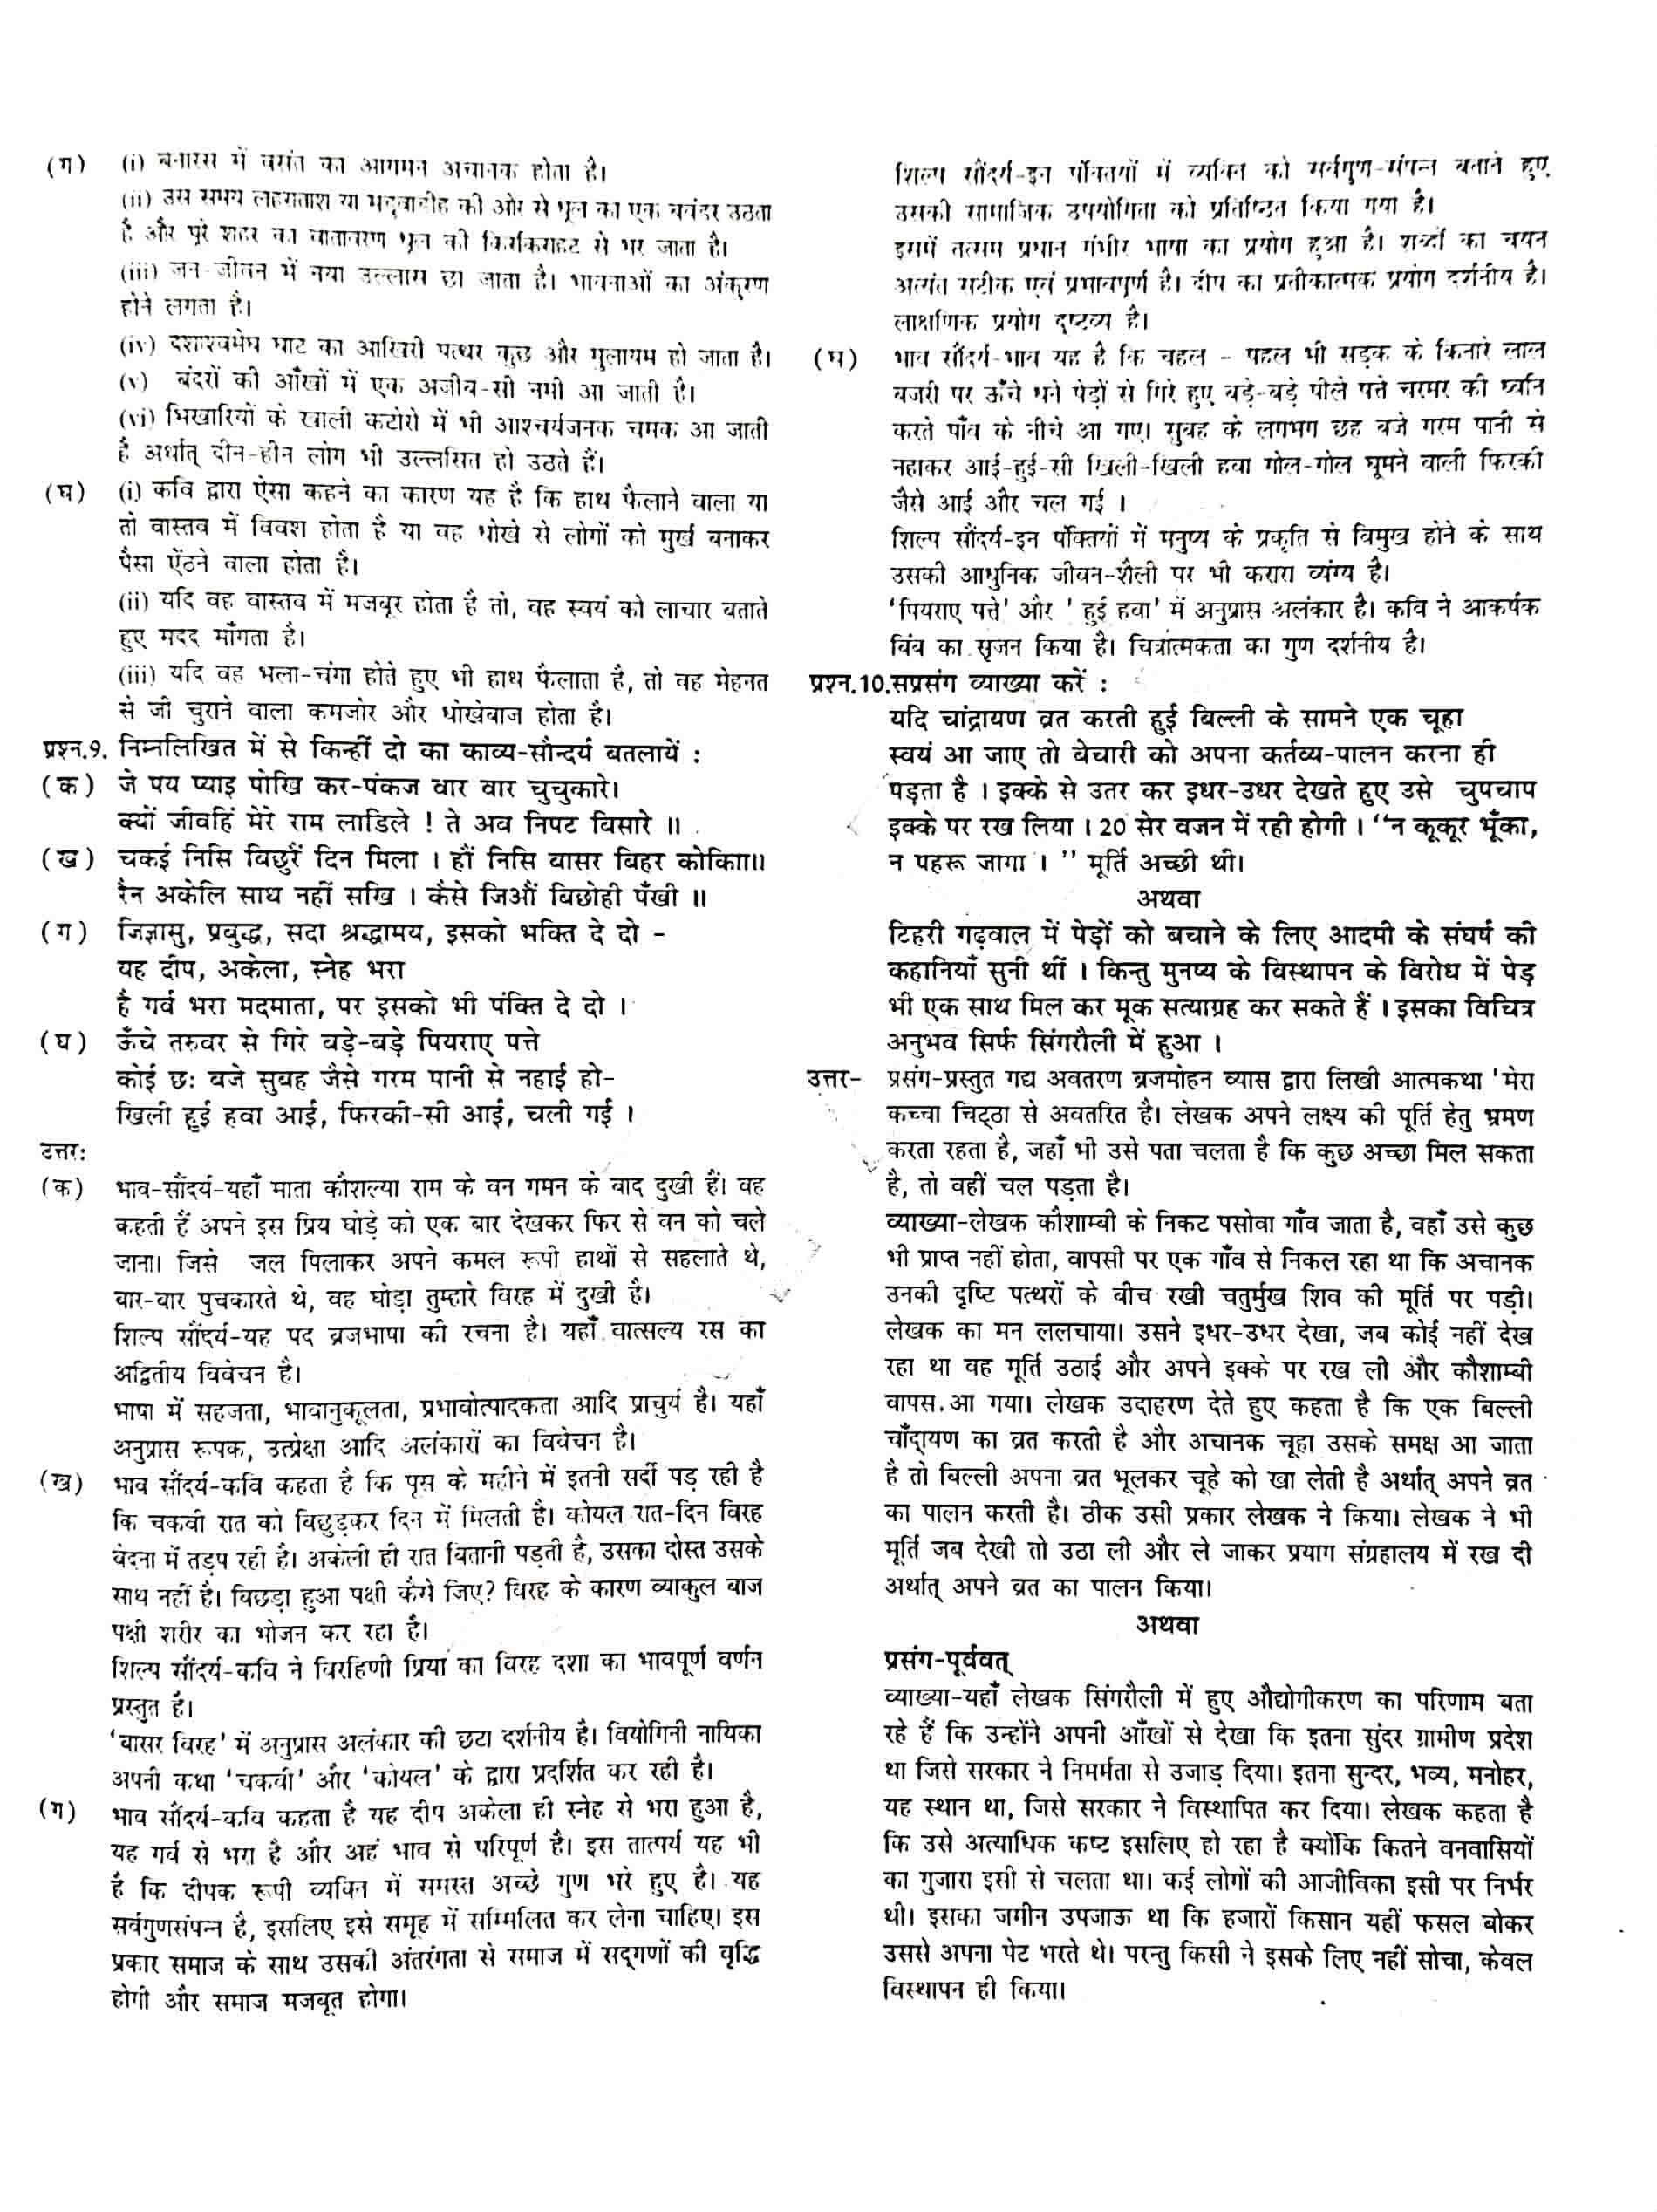 JAC Class 12 hindi 2018 Question Paper 04